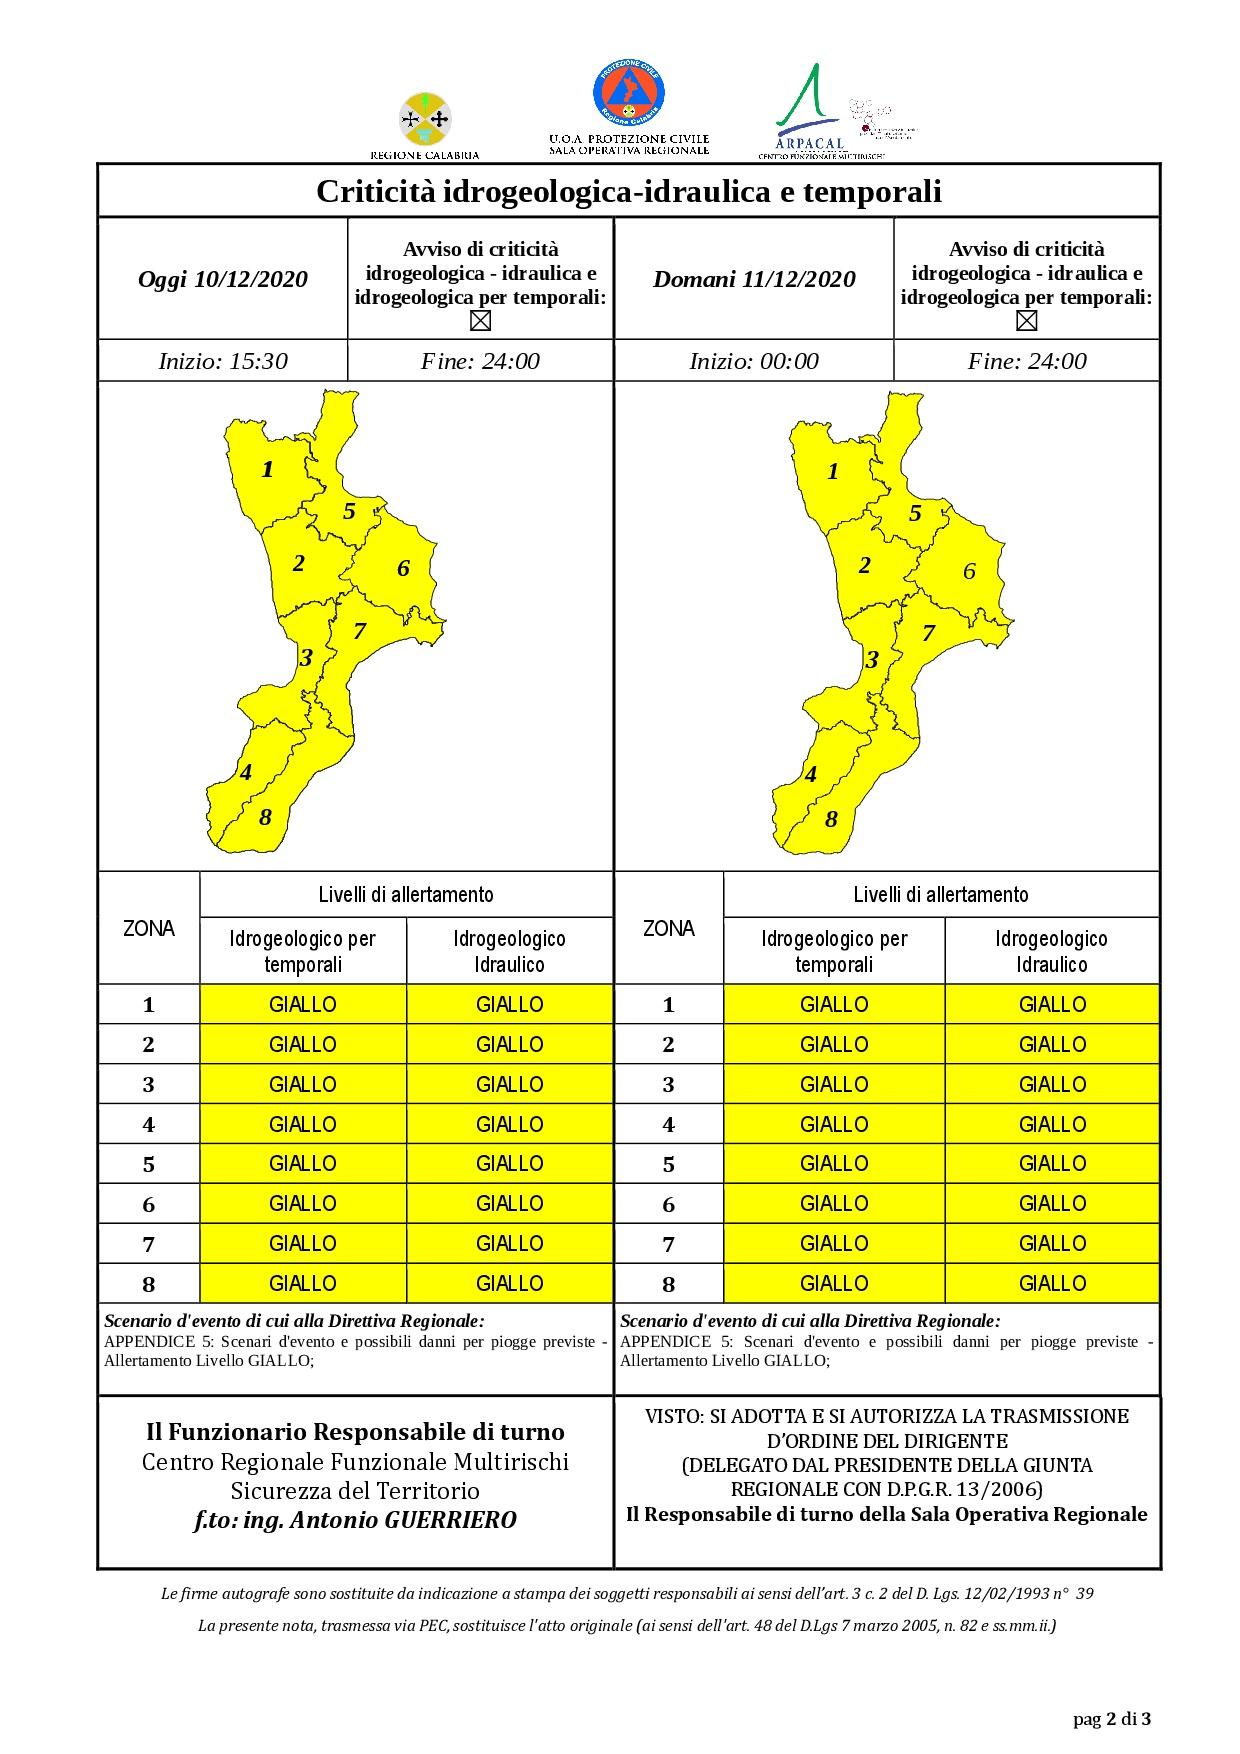 Criticità idrogeologica-idraulica e temporali in Calabria 10-12-2020